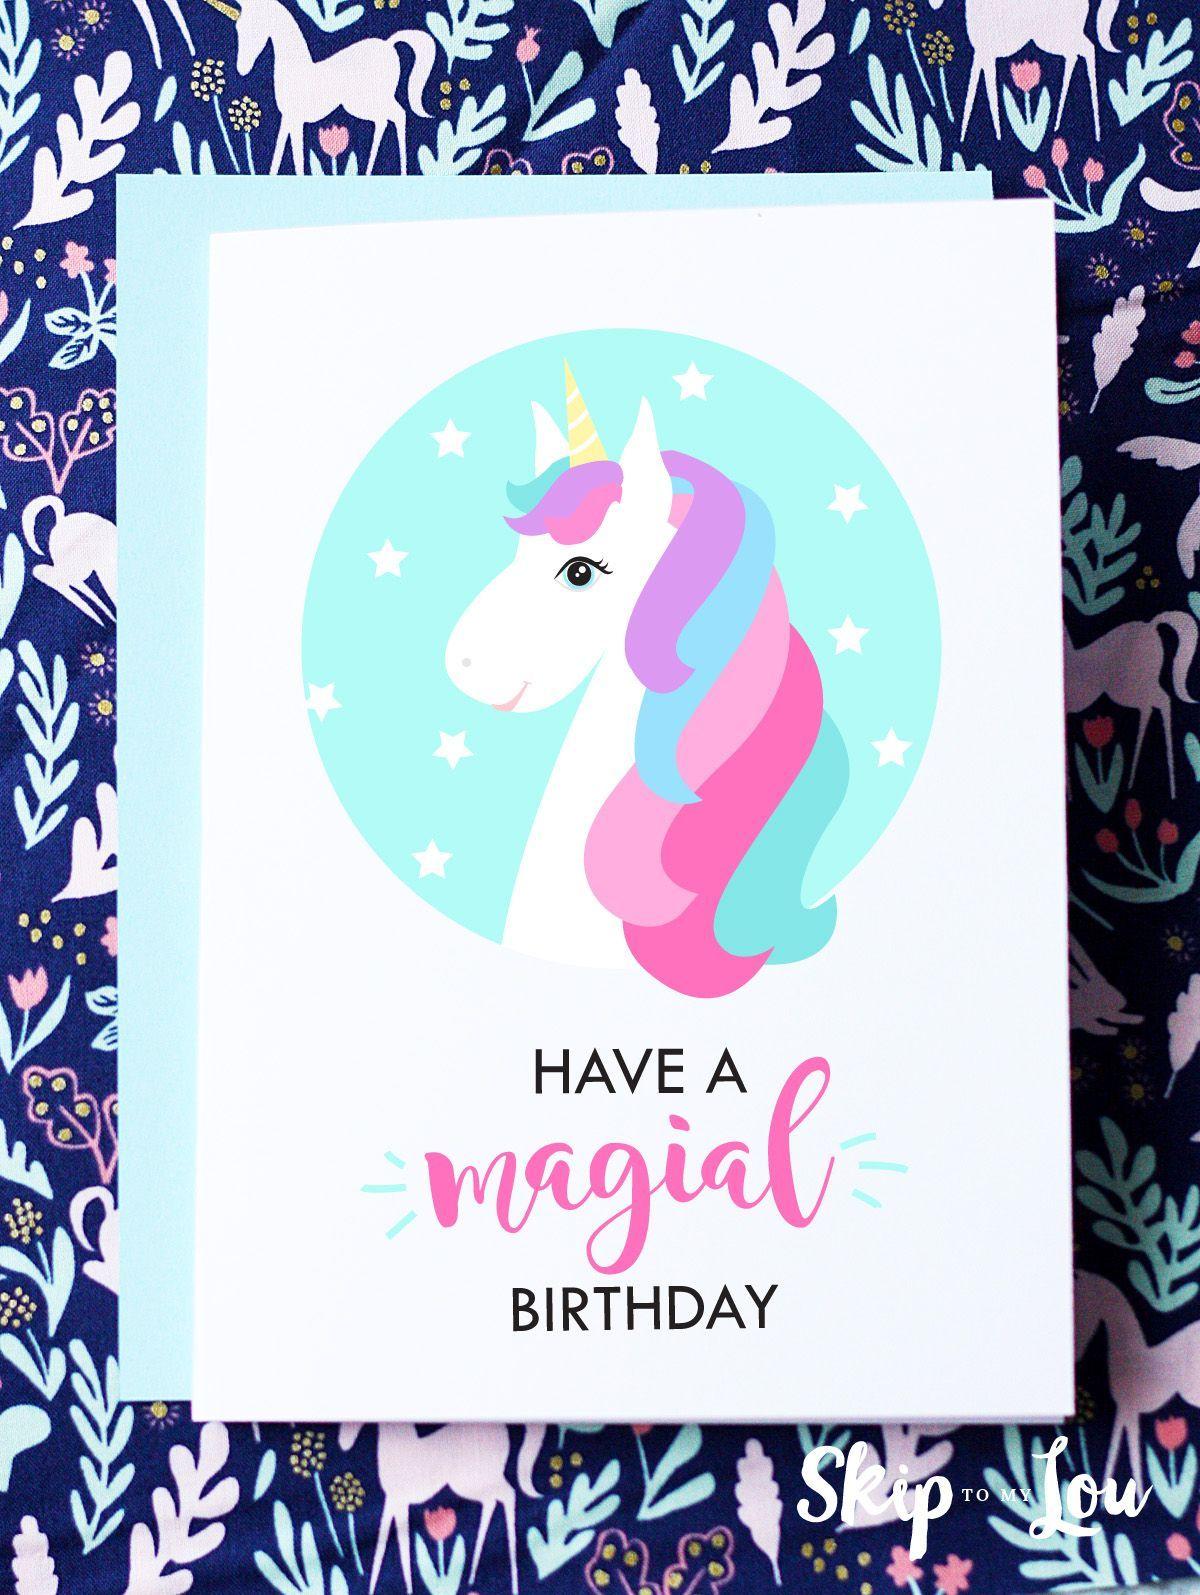 Free Printable Birthday Cards Happy Birthday Cards Printable Unicorn Birthday Cards Free Printable Birthday Cards